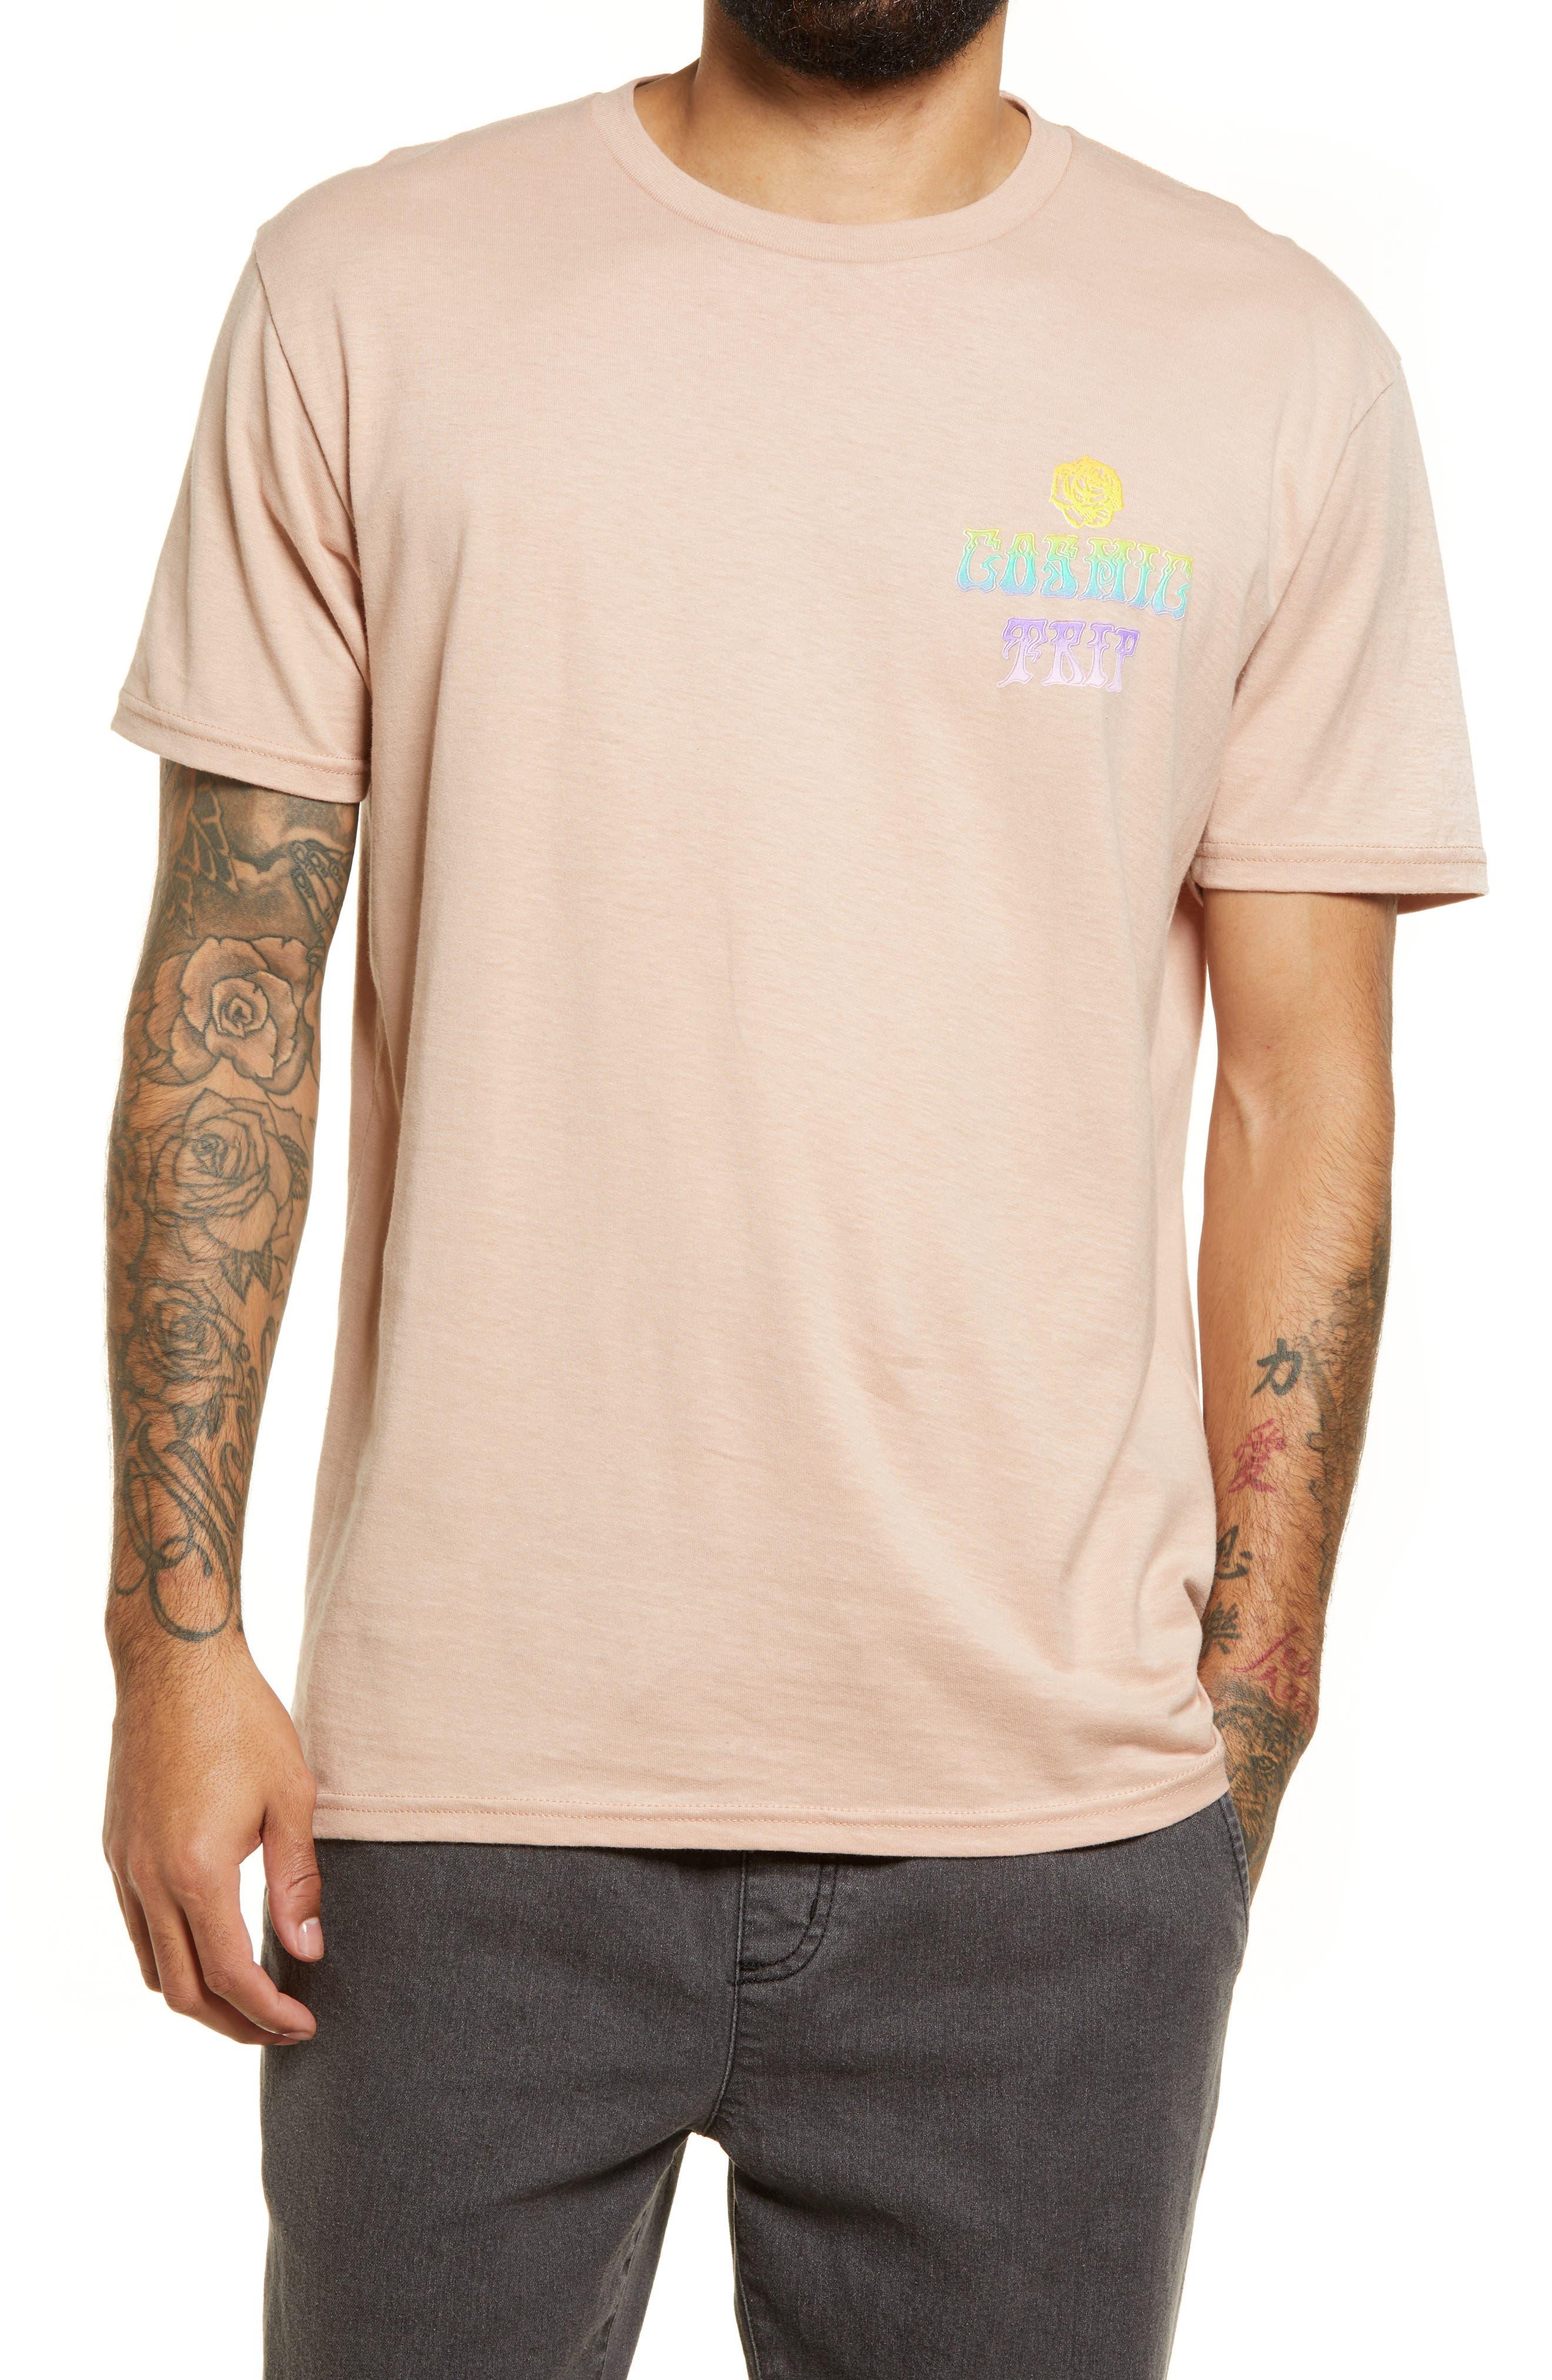 Lira Clothing Men's Lira Clothing Parnell Graphic Tee, Size Large - Pink